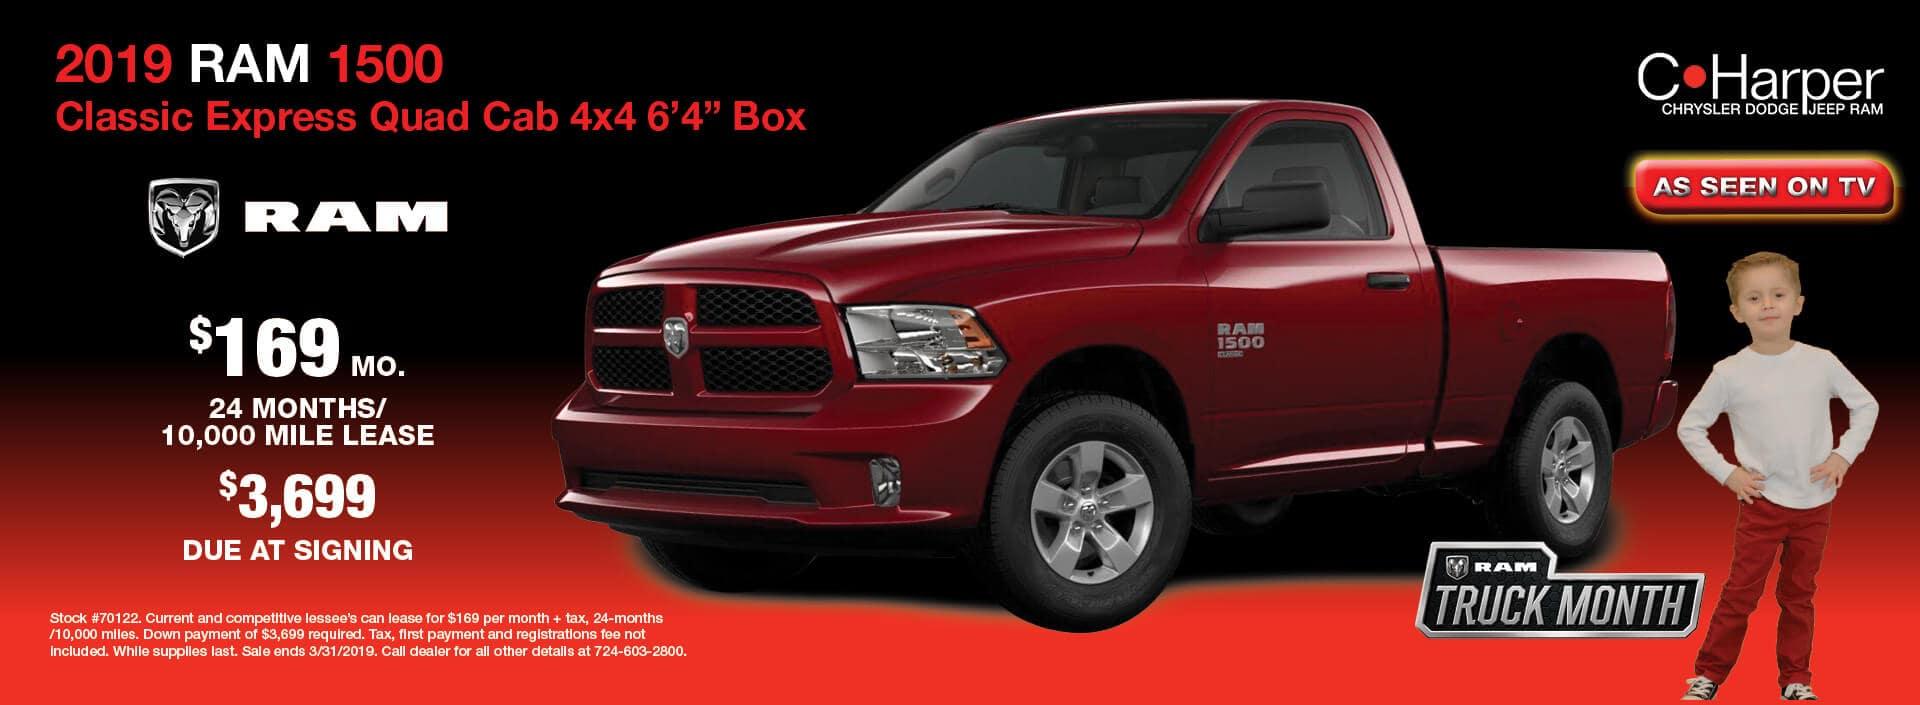 "2019 Ram 1500 Classic Express Quad Cab 4X4 6'4"" Box"